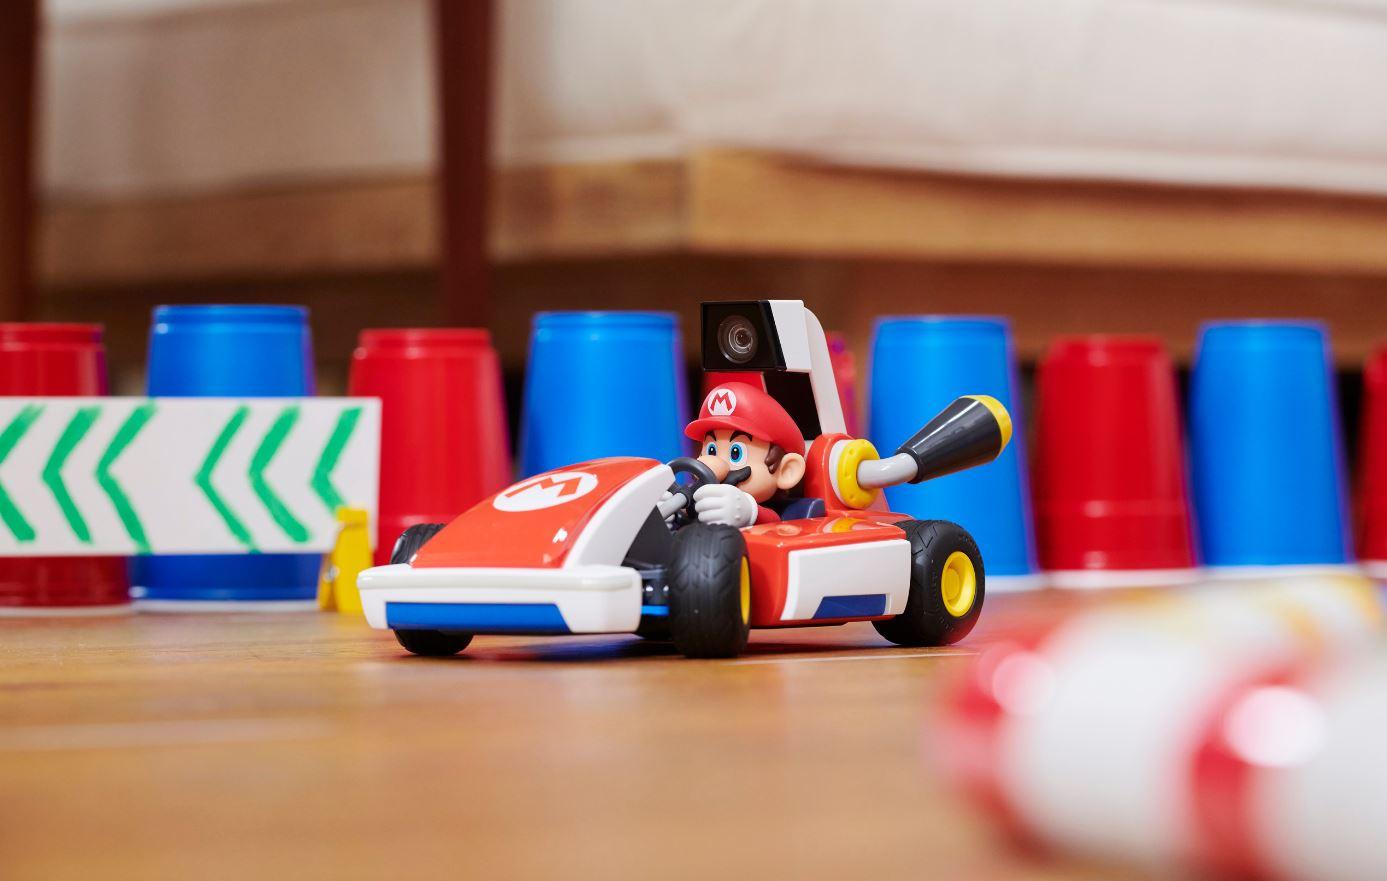 Mario Kart Live: Home Circuit serves up real-world AR kart racing - SlashGear